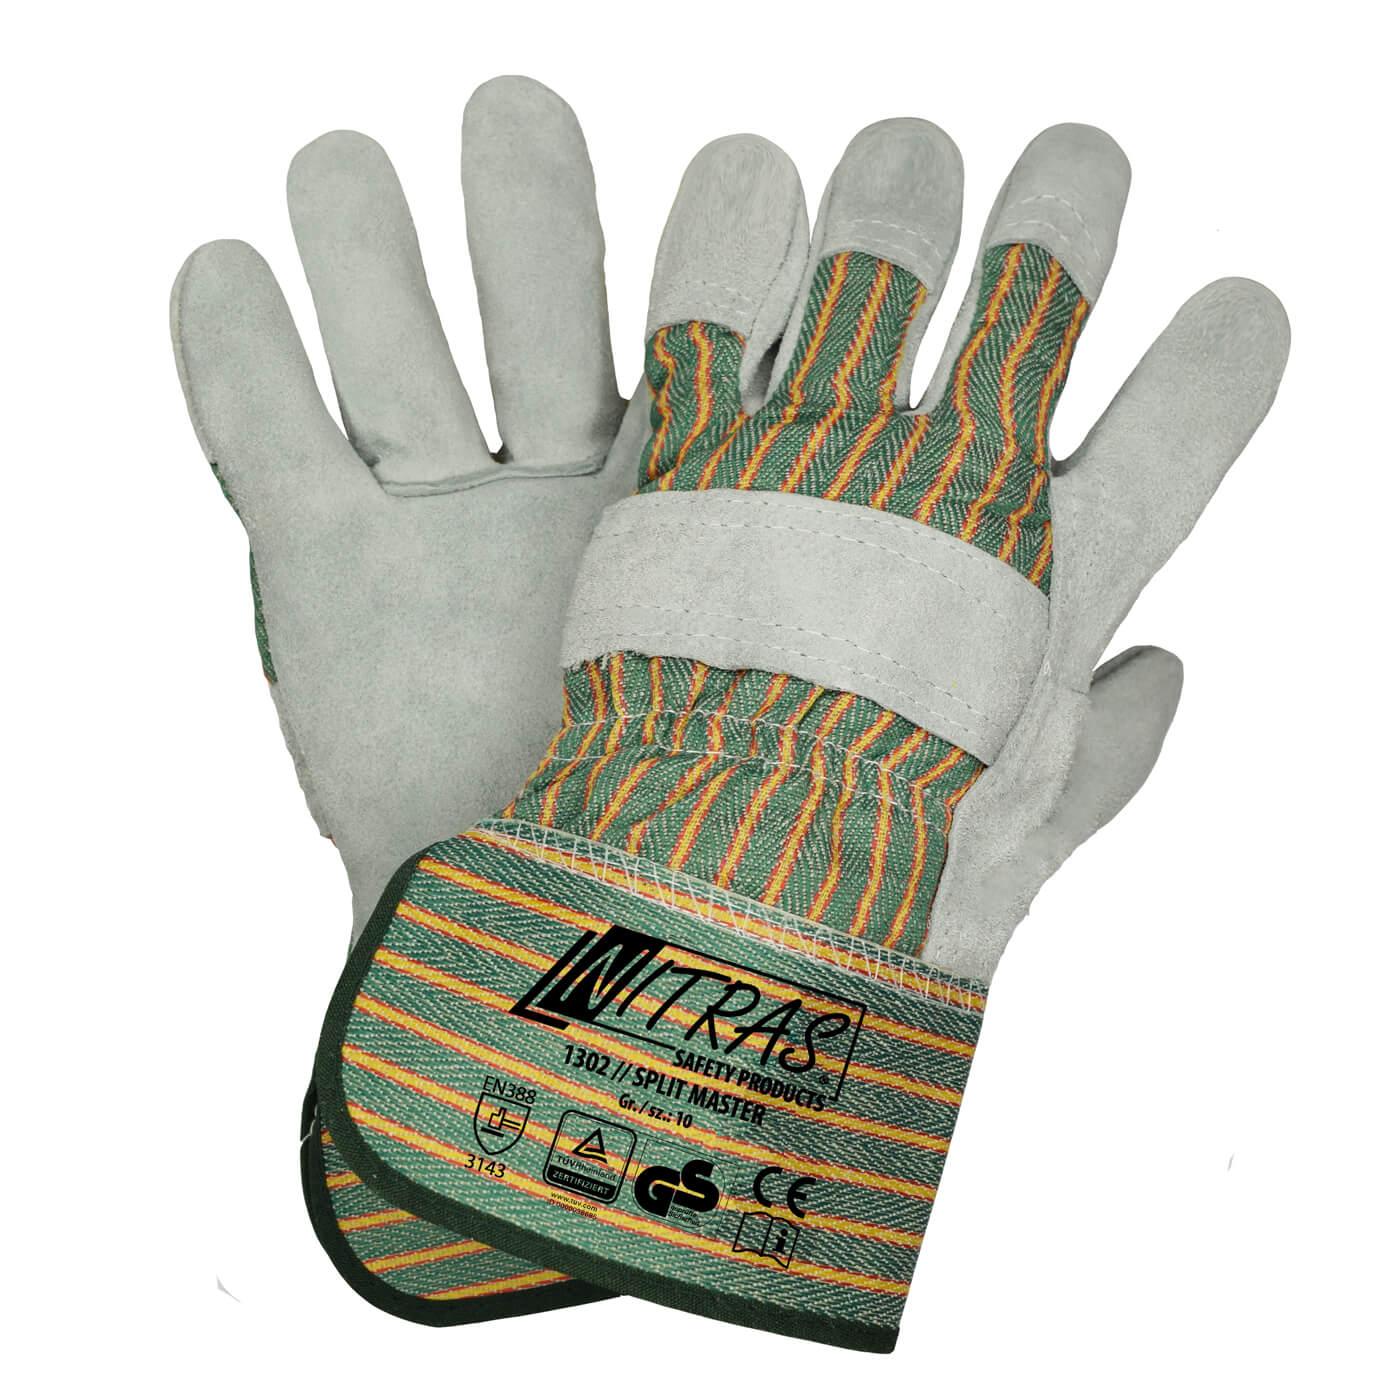 Rękawice skórzane Nitras 1302/ SPLIT MASTER